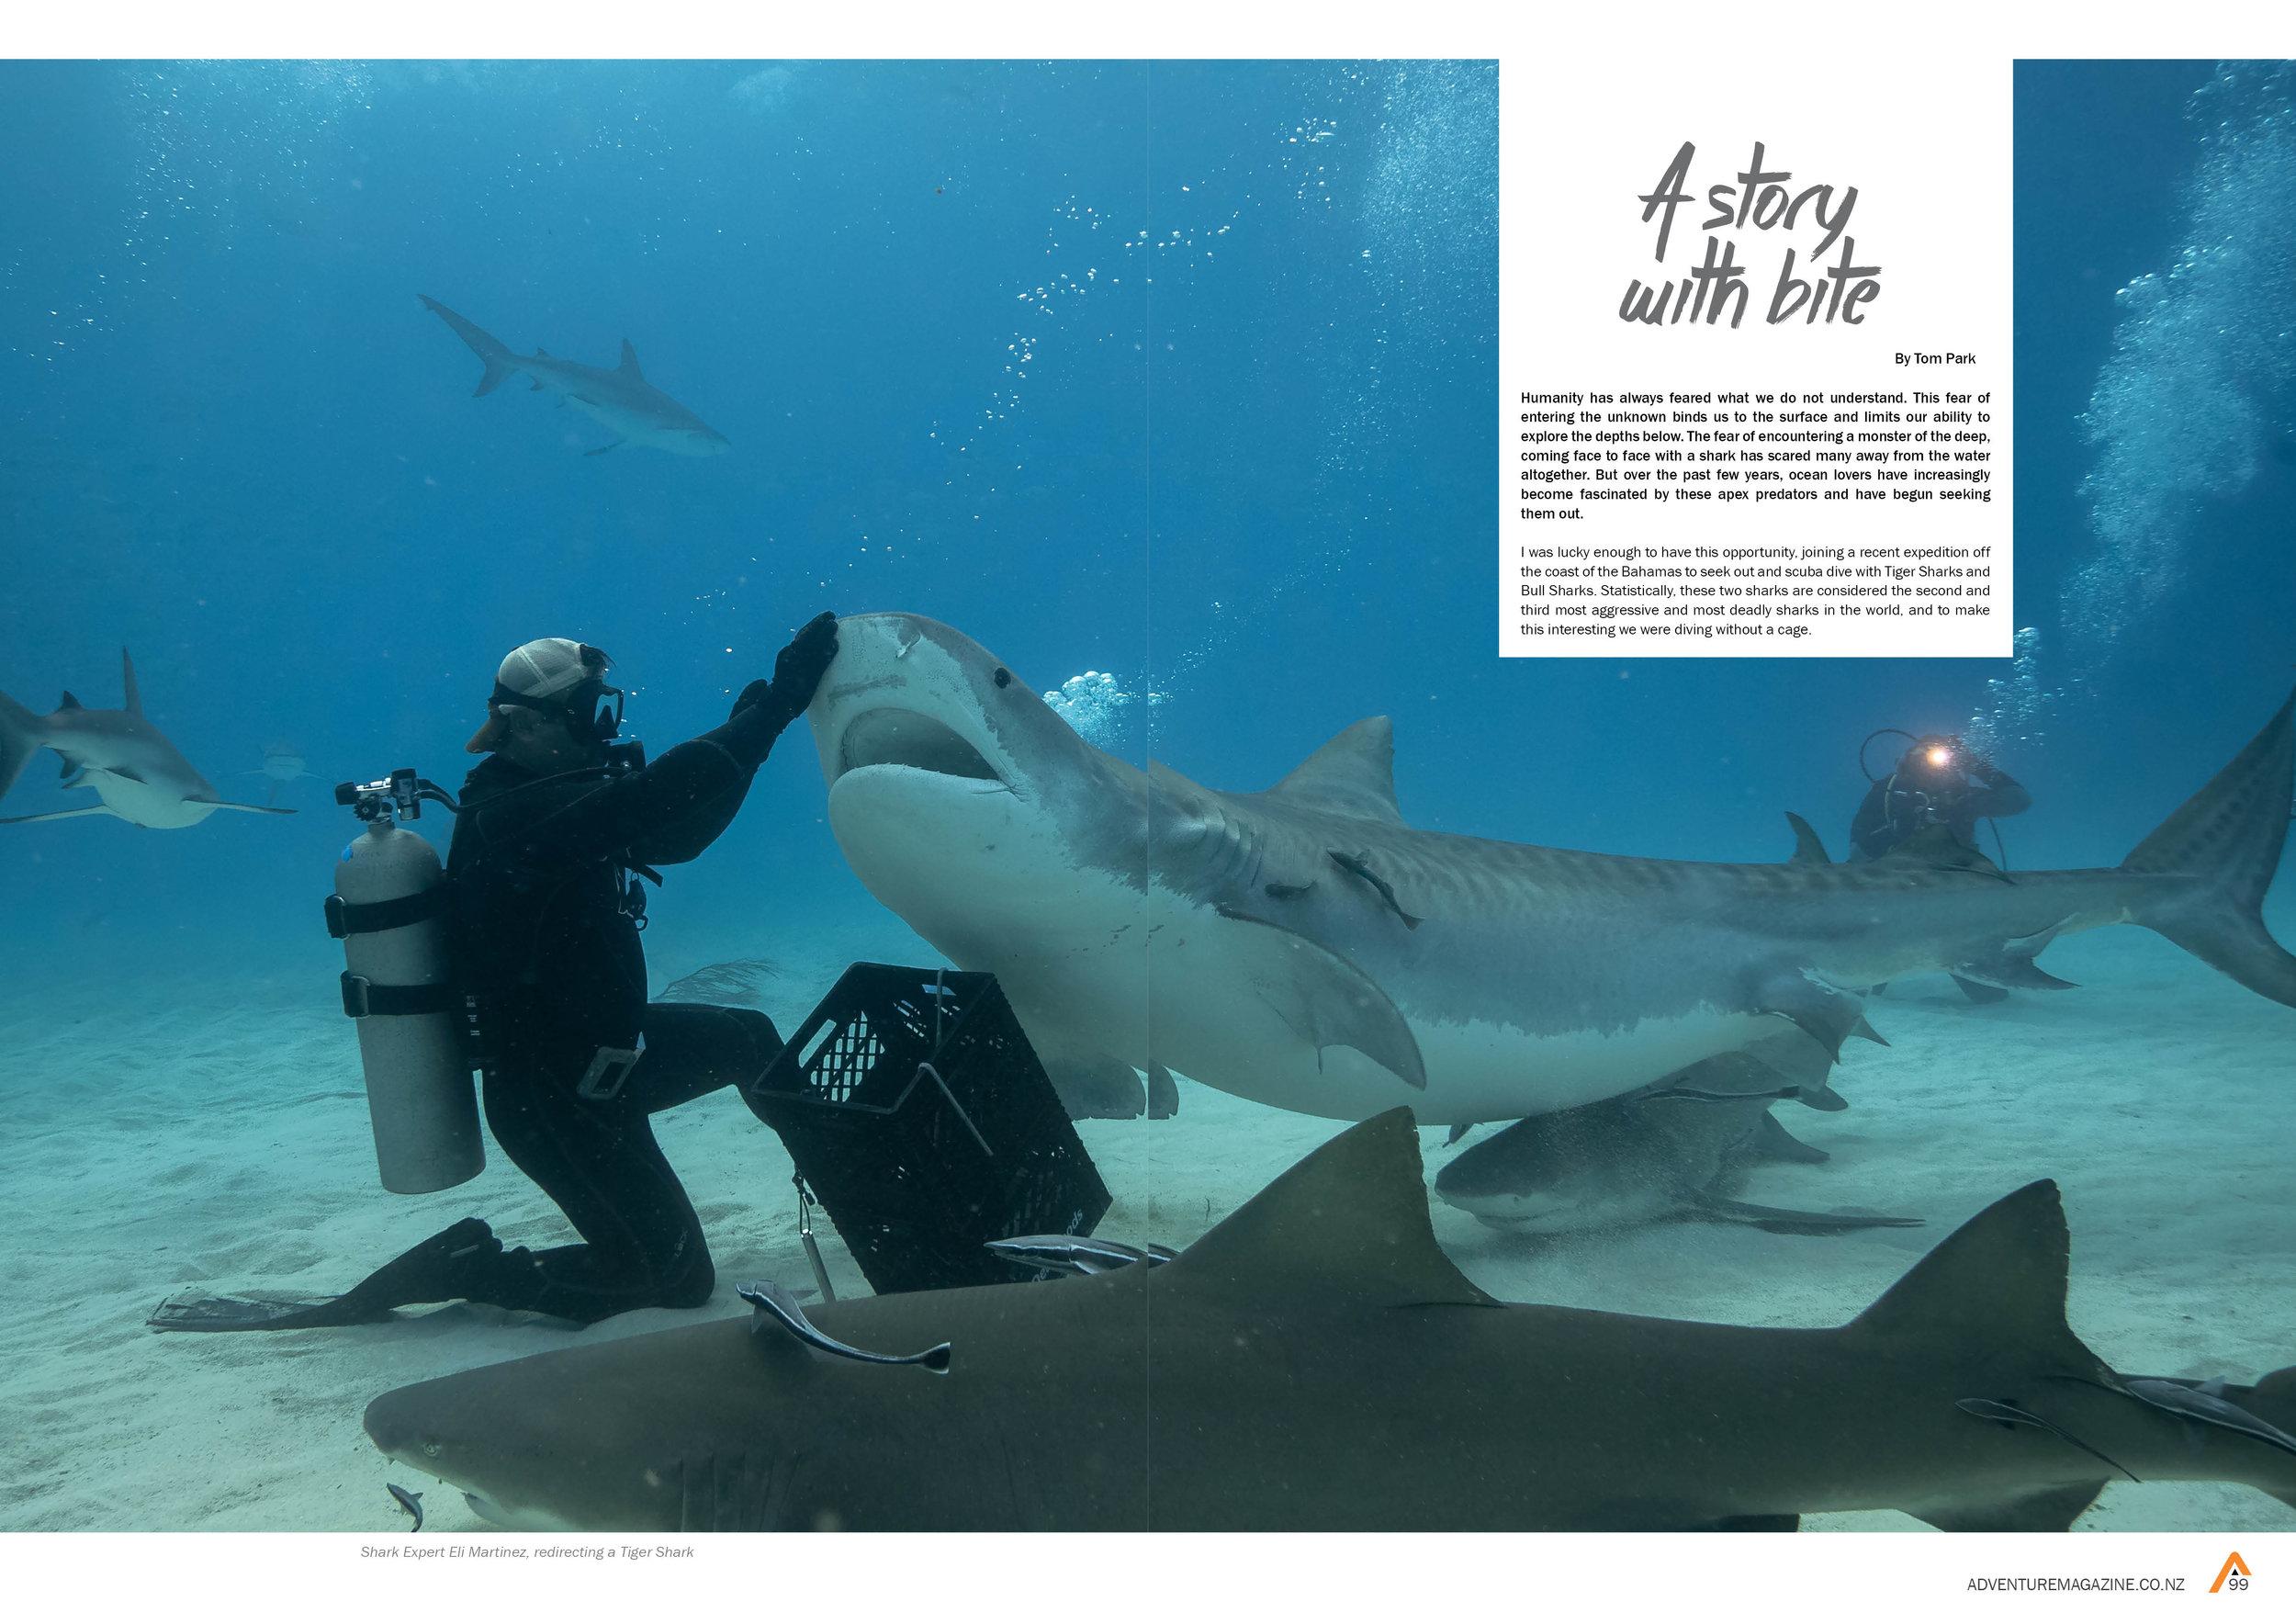 Publication in Adventure Magazine - Ocean Edition